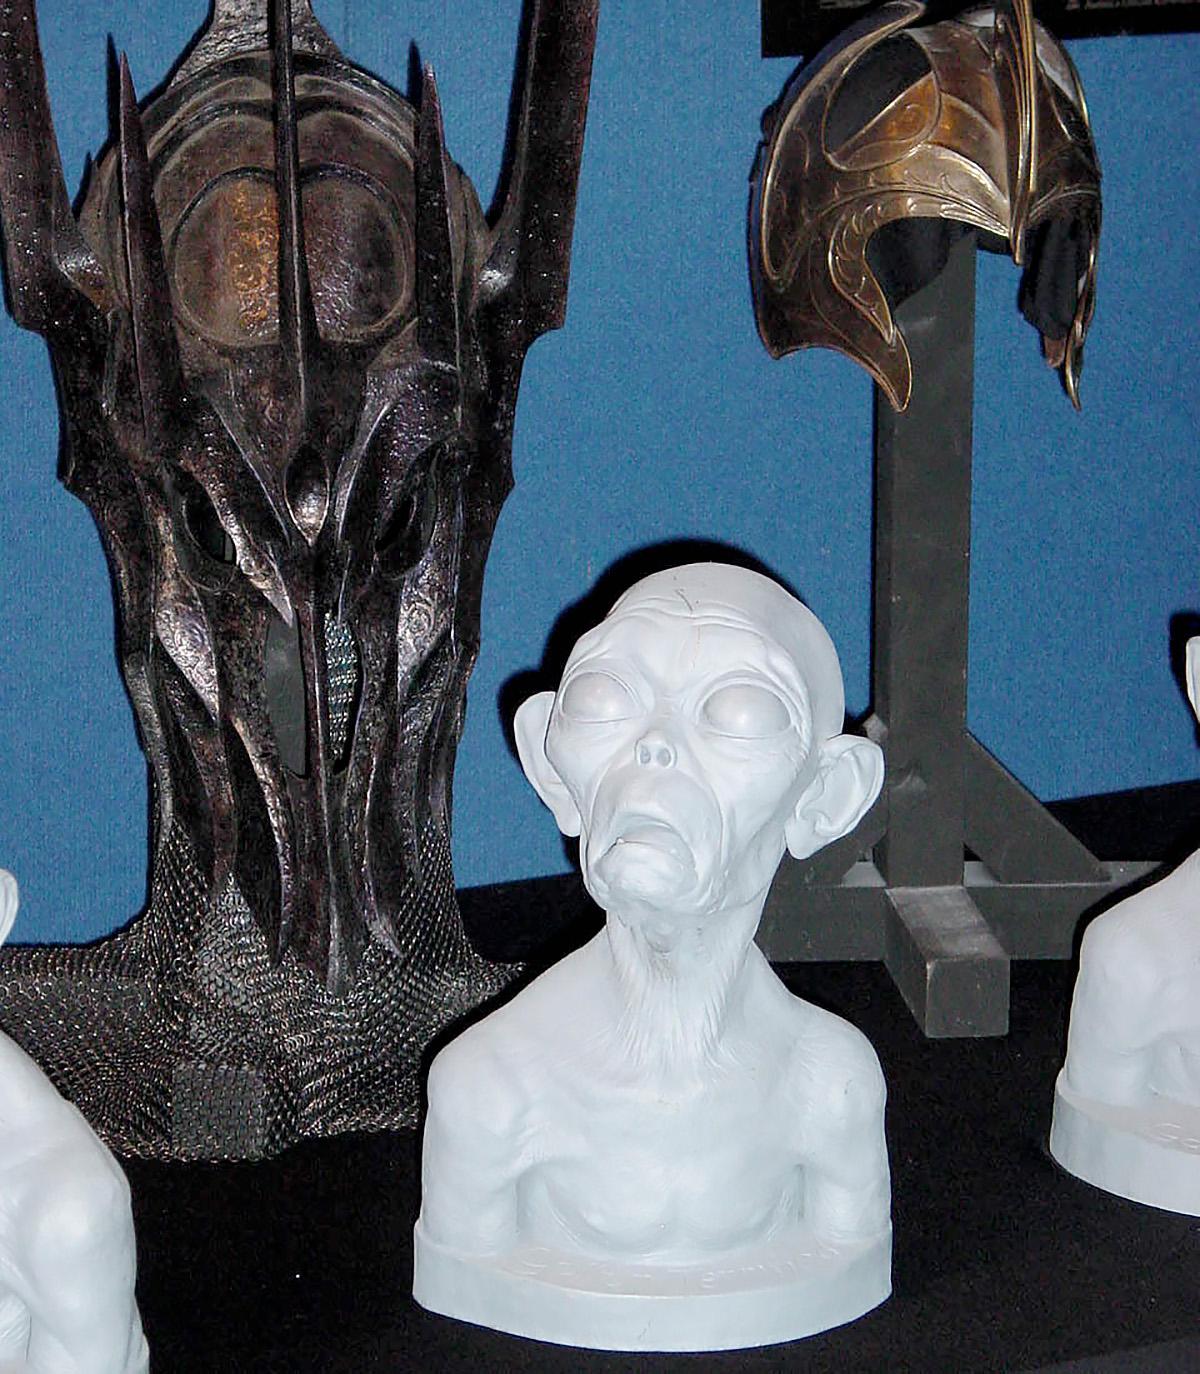 Weta 'Lord of the Rings' Display